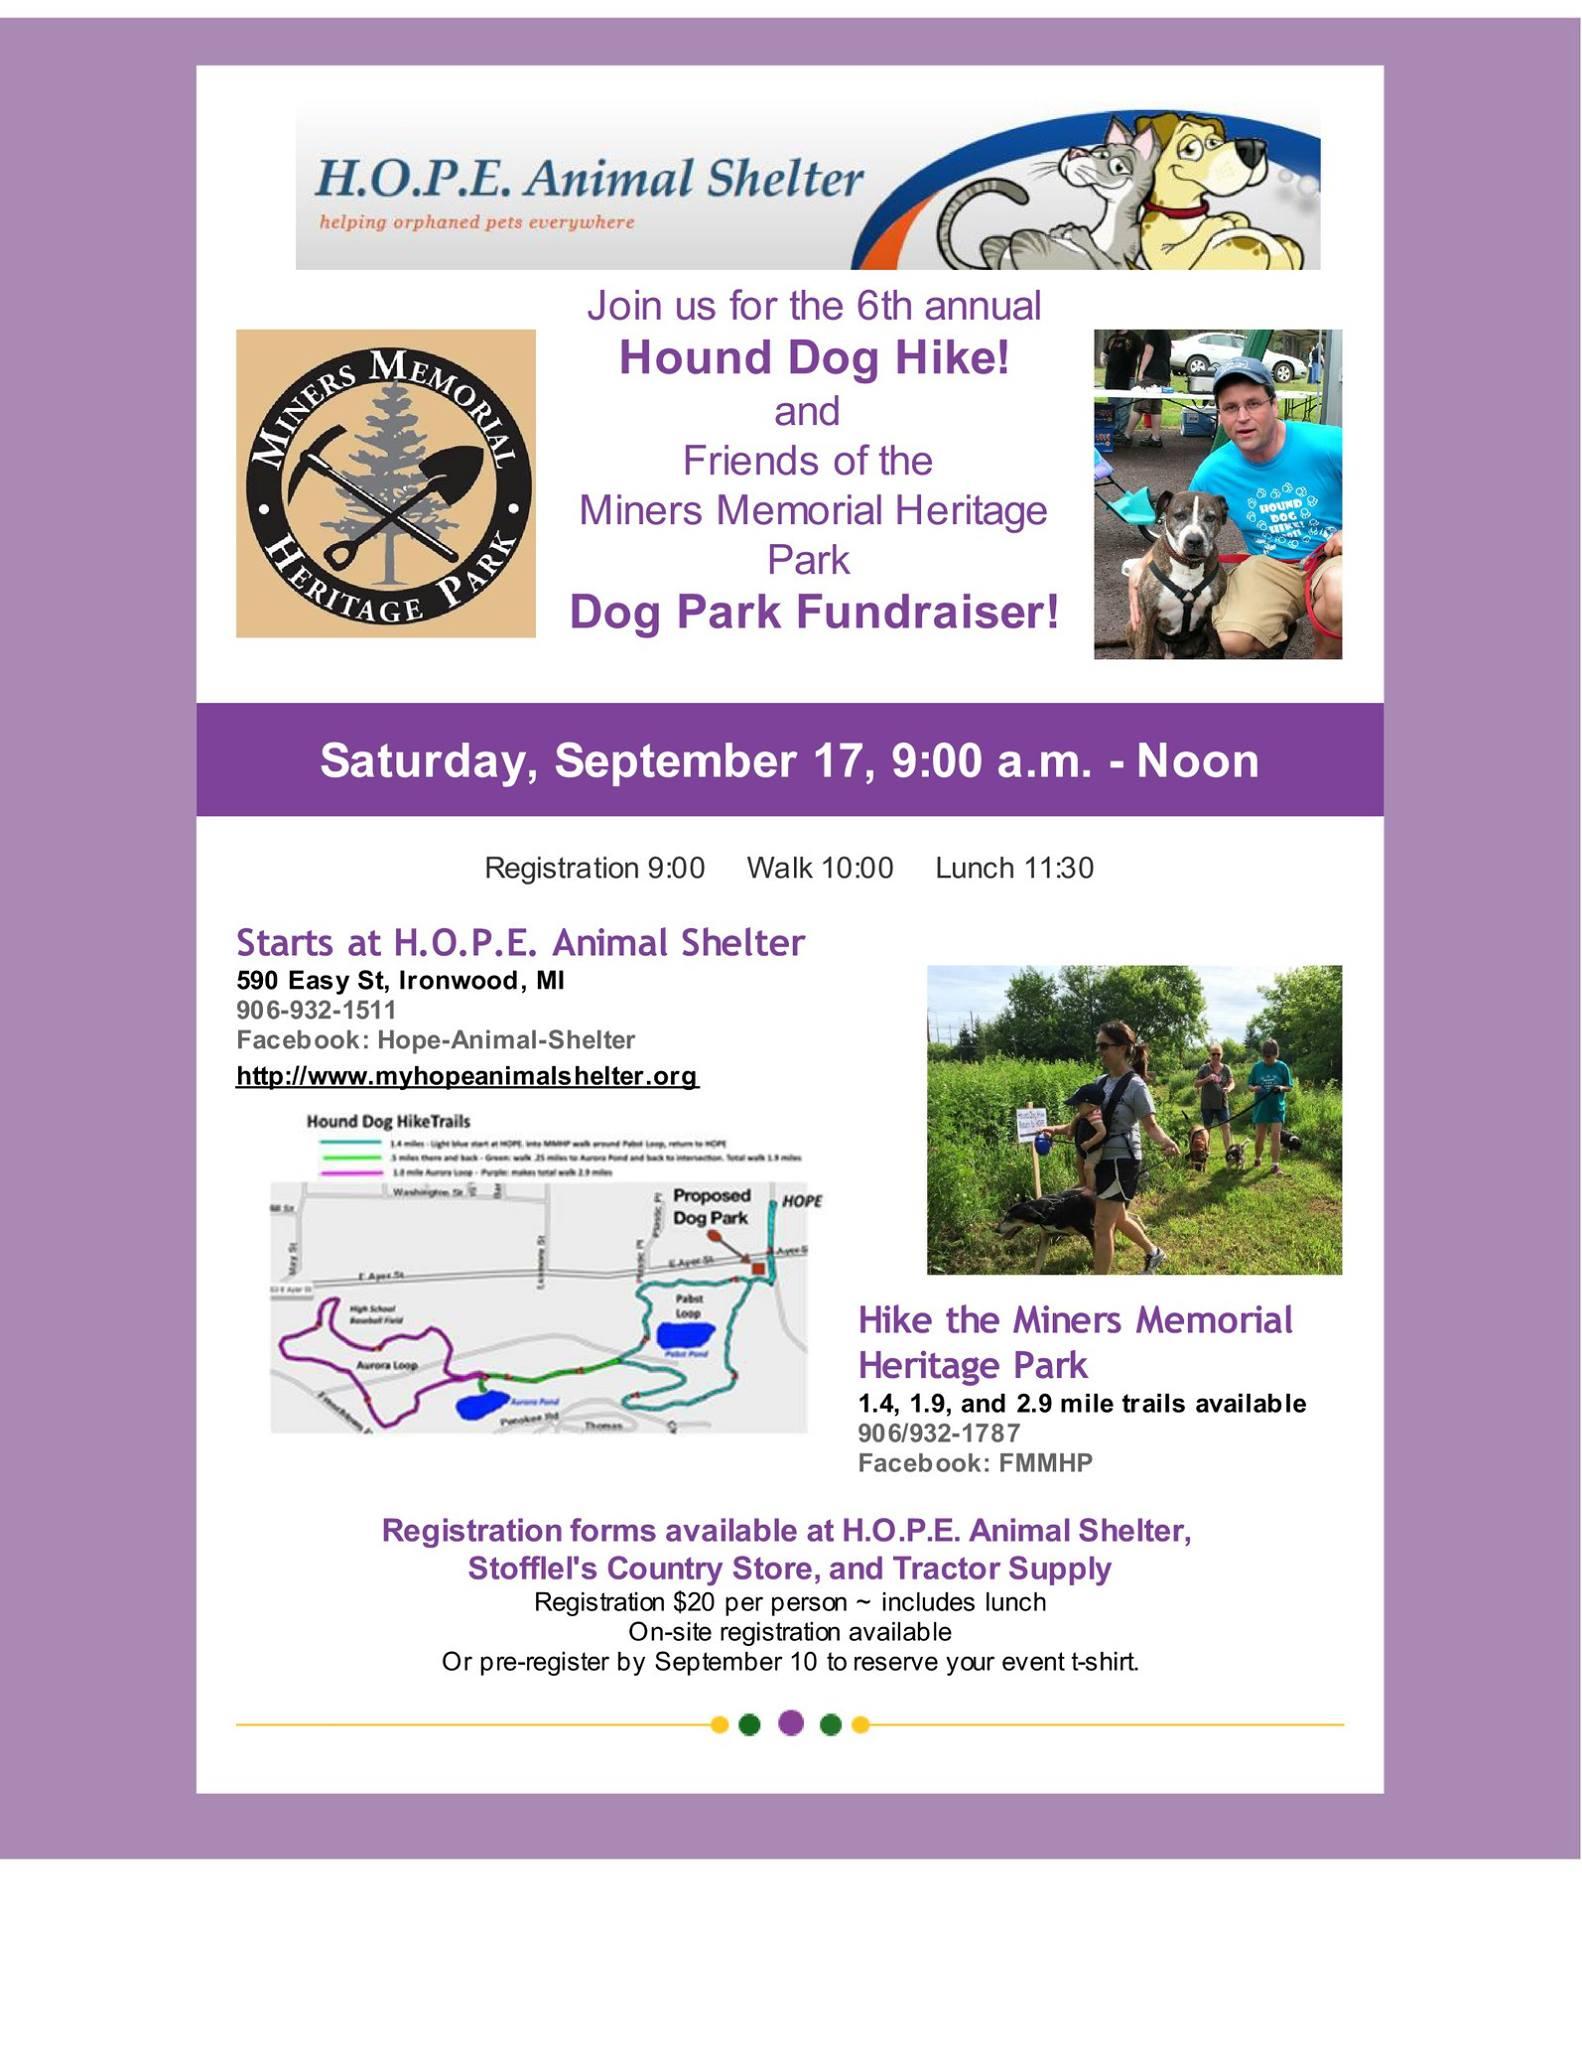 6th Annual Hound Dog Hike - BPLA